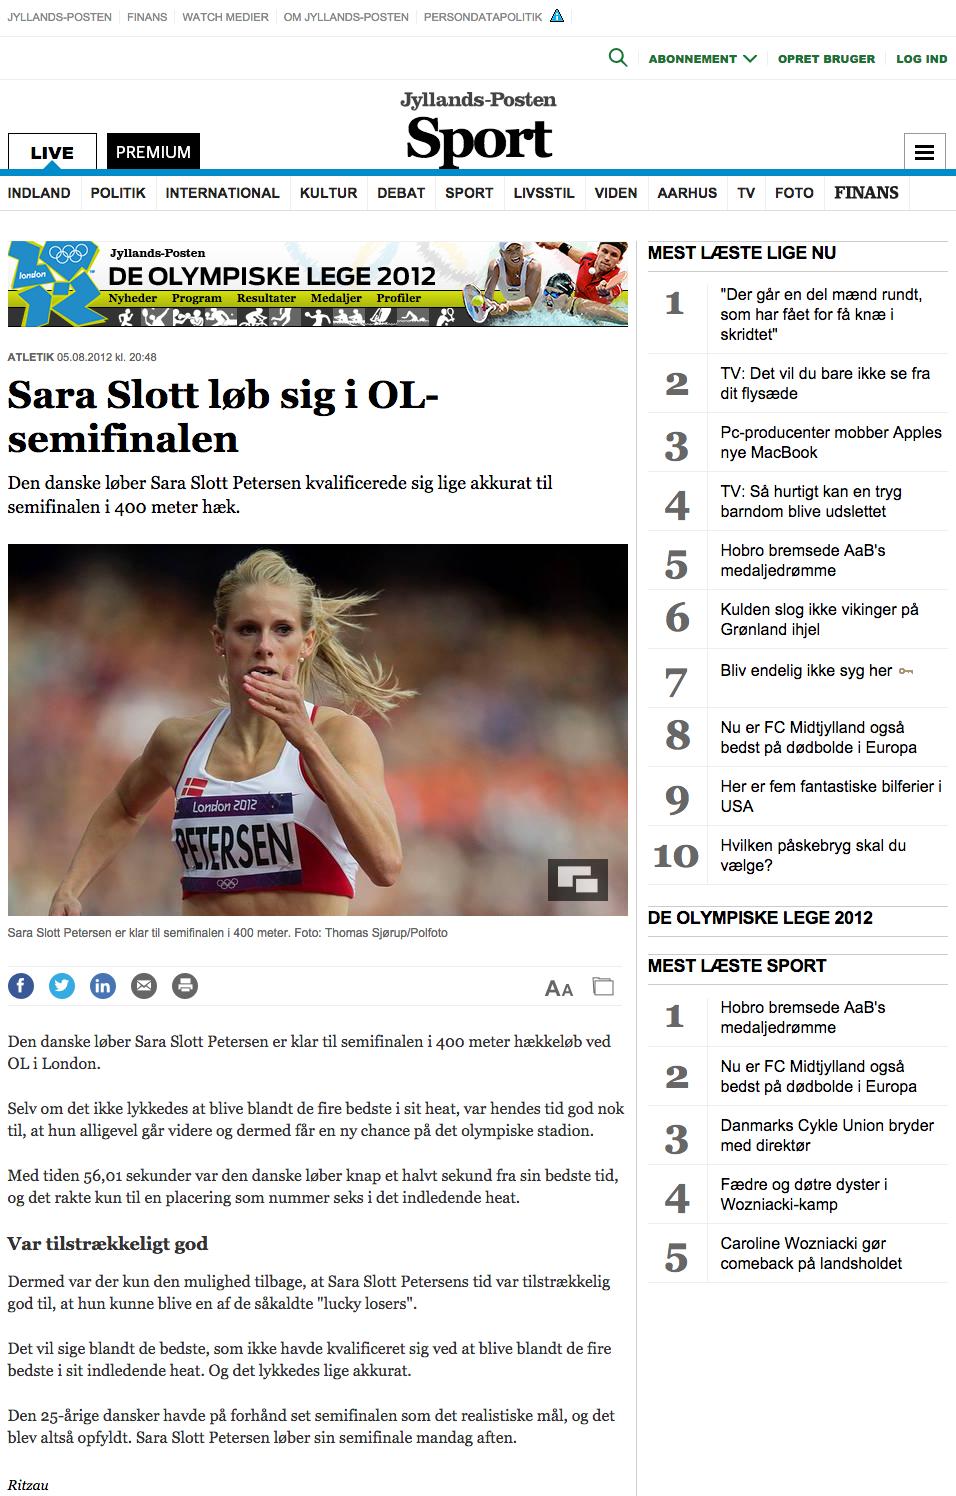 Sara Slott løb sig i OL-semifinalen - Atletik - OL 2012 - Sport